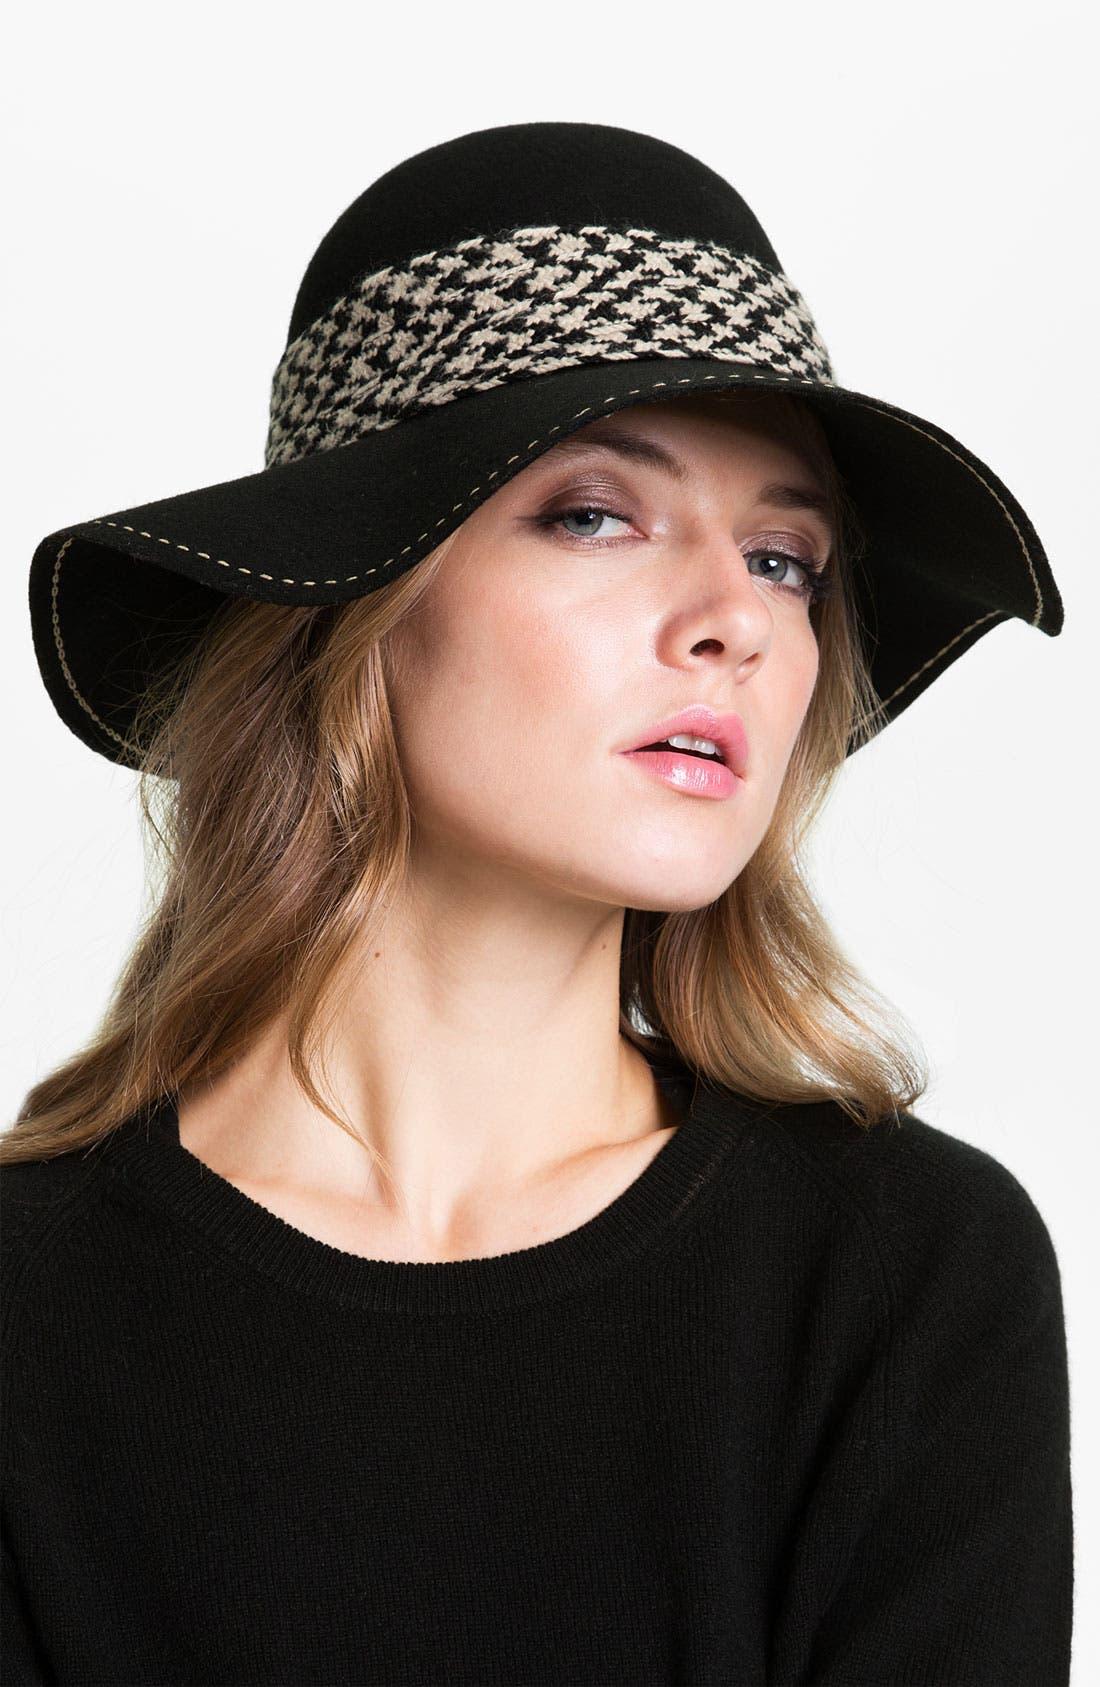 Alternate Image 1 Selected - Halogen® Houndstooth Trim Floppy Wool Hat